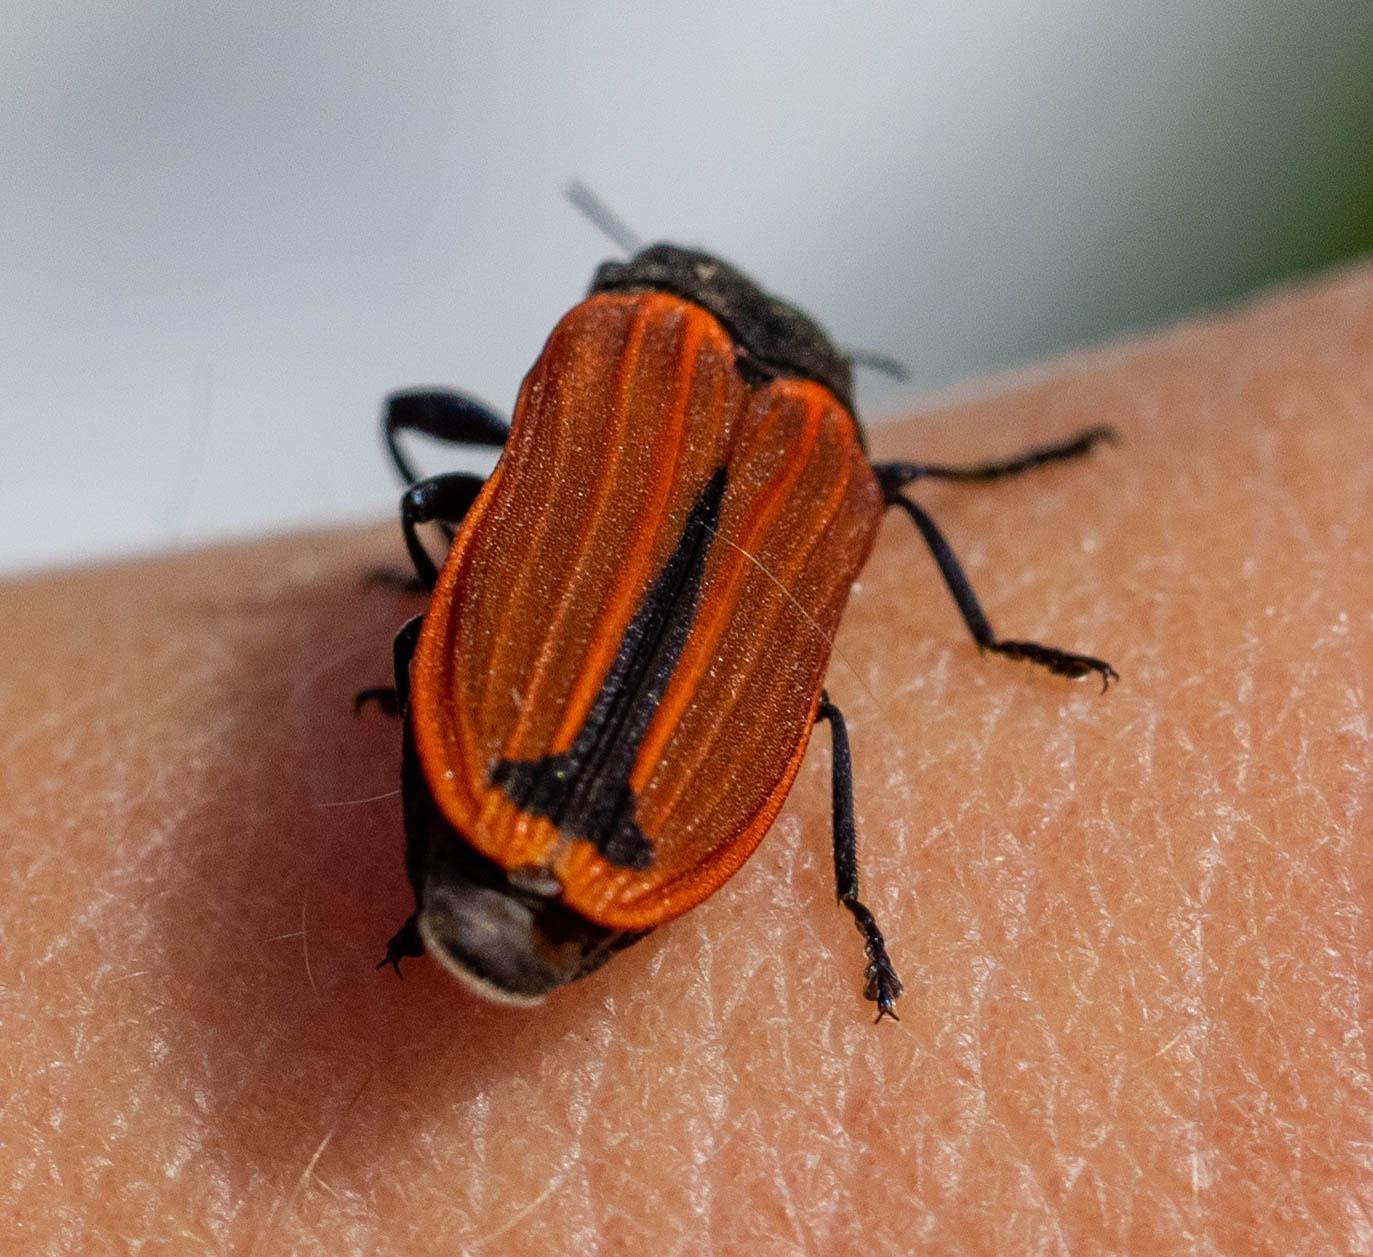 Jewel Beetle (Castiarina erythroptera)